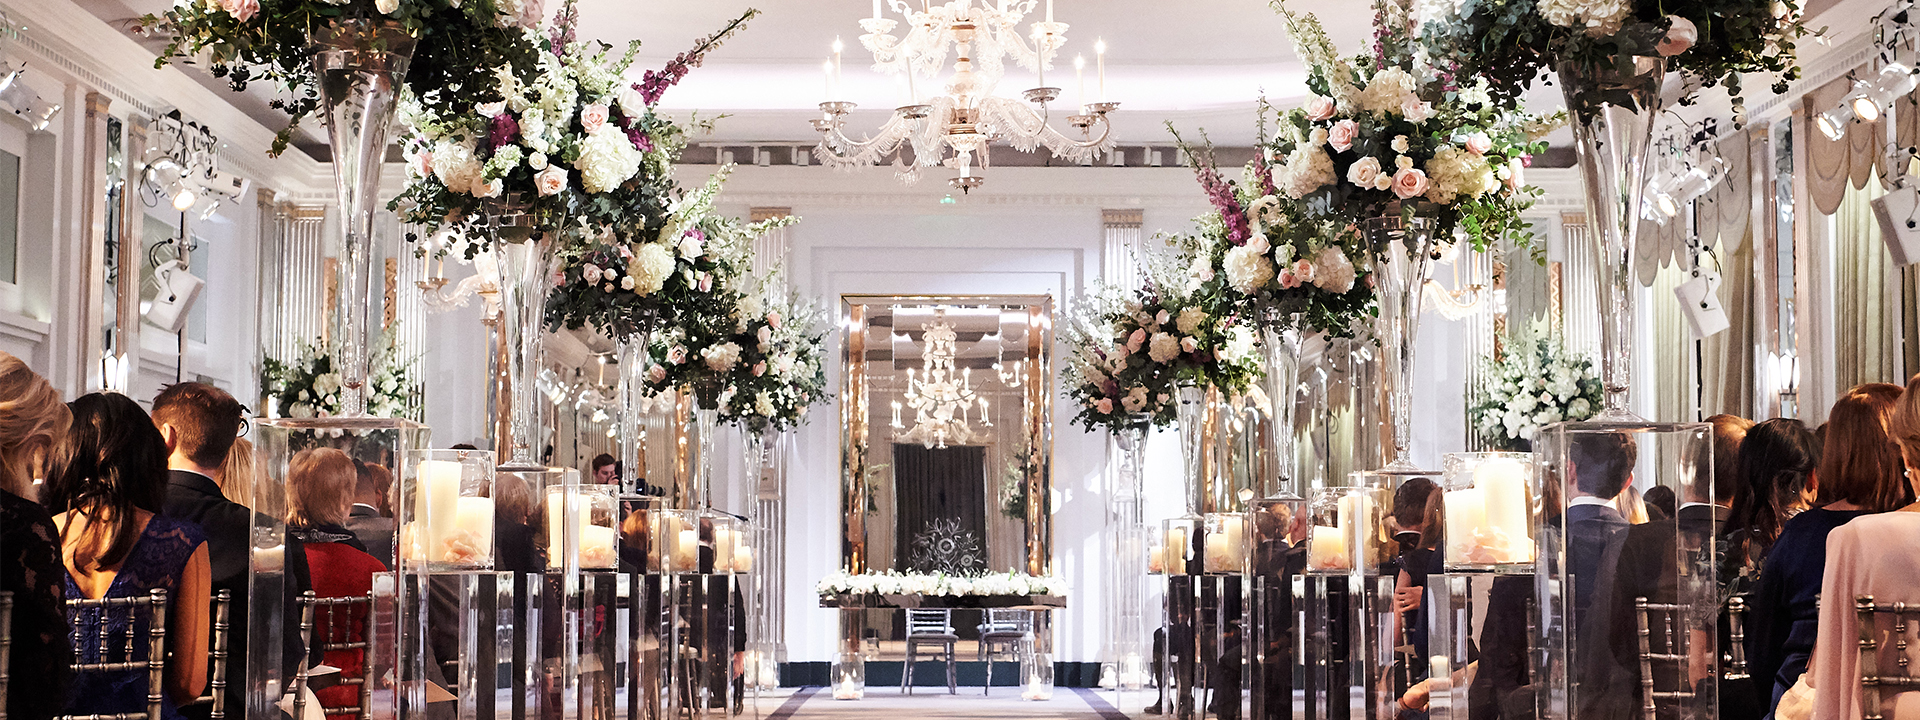 Wedding at the Claridge's event room